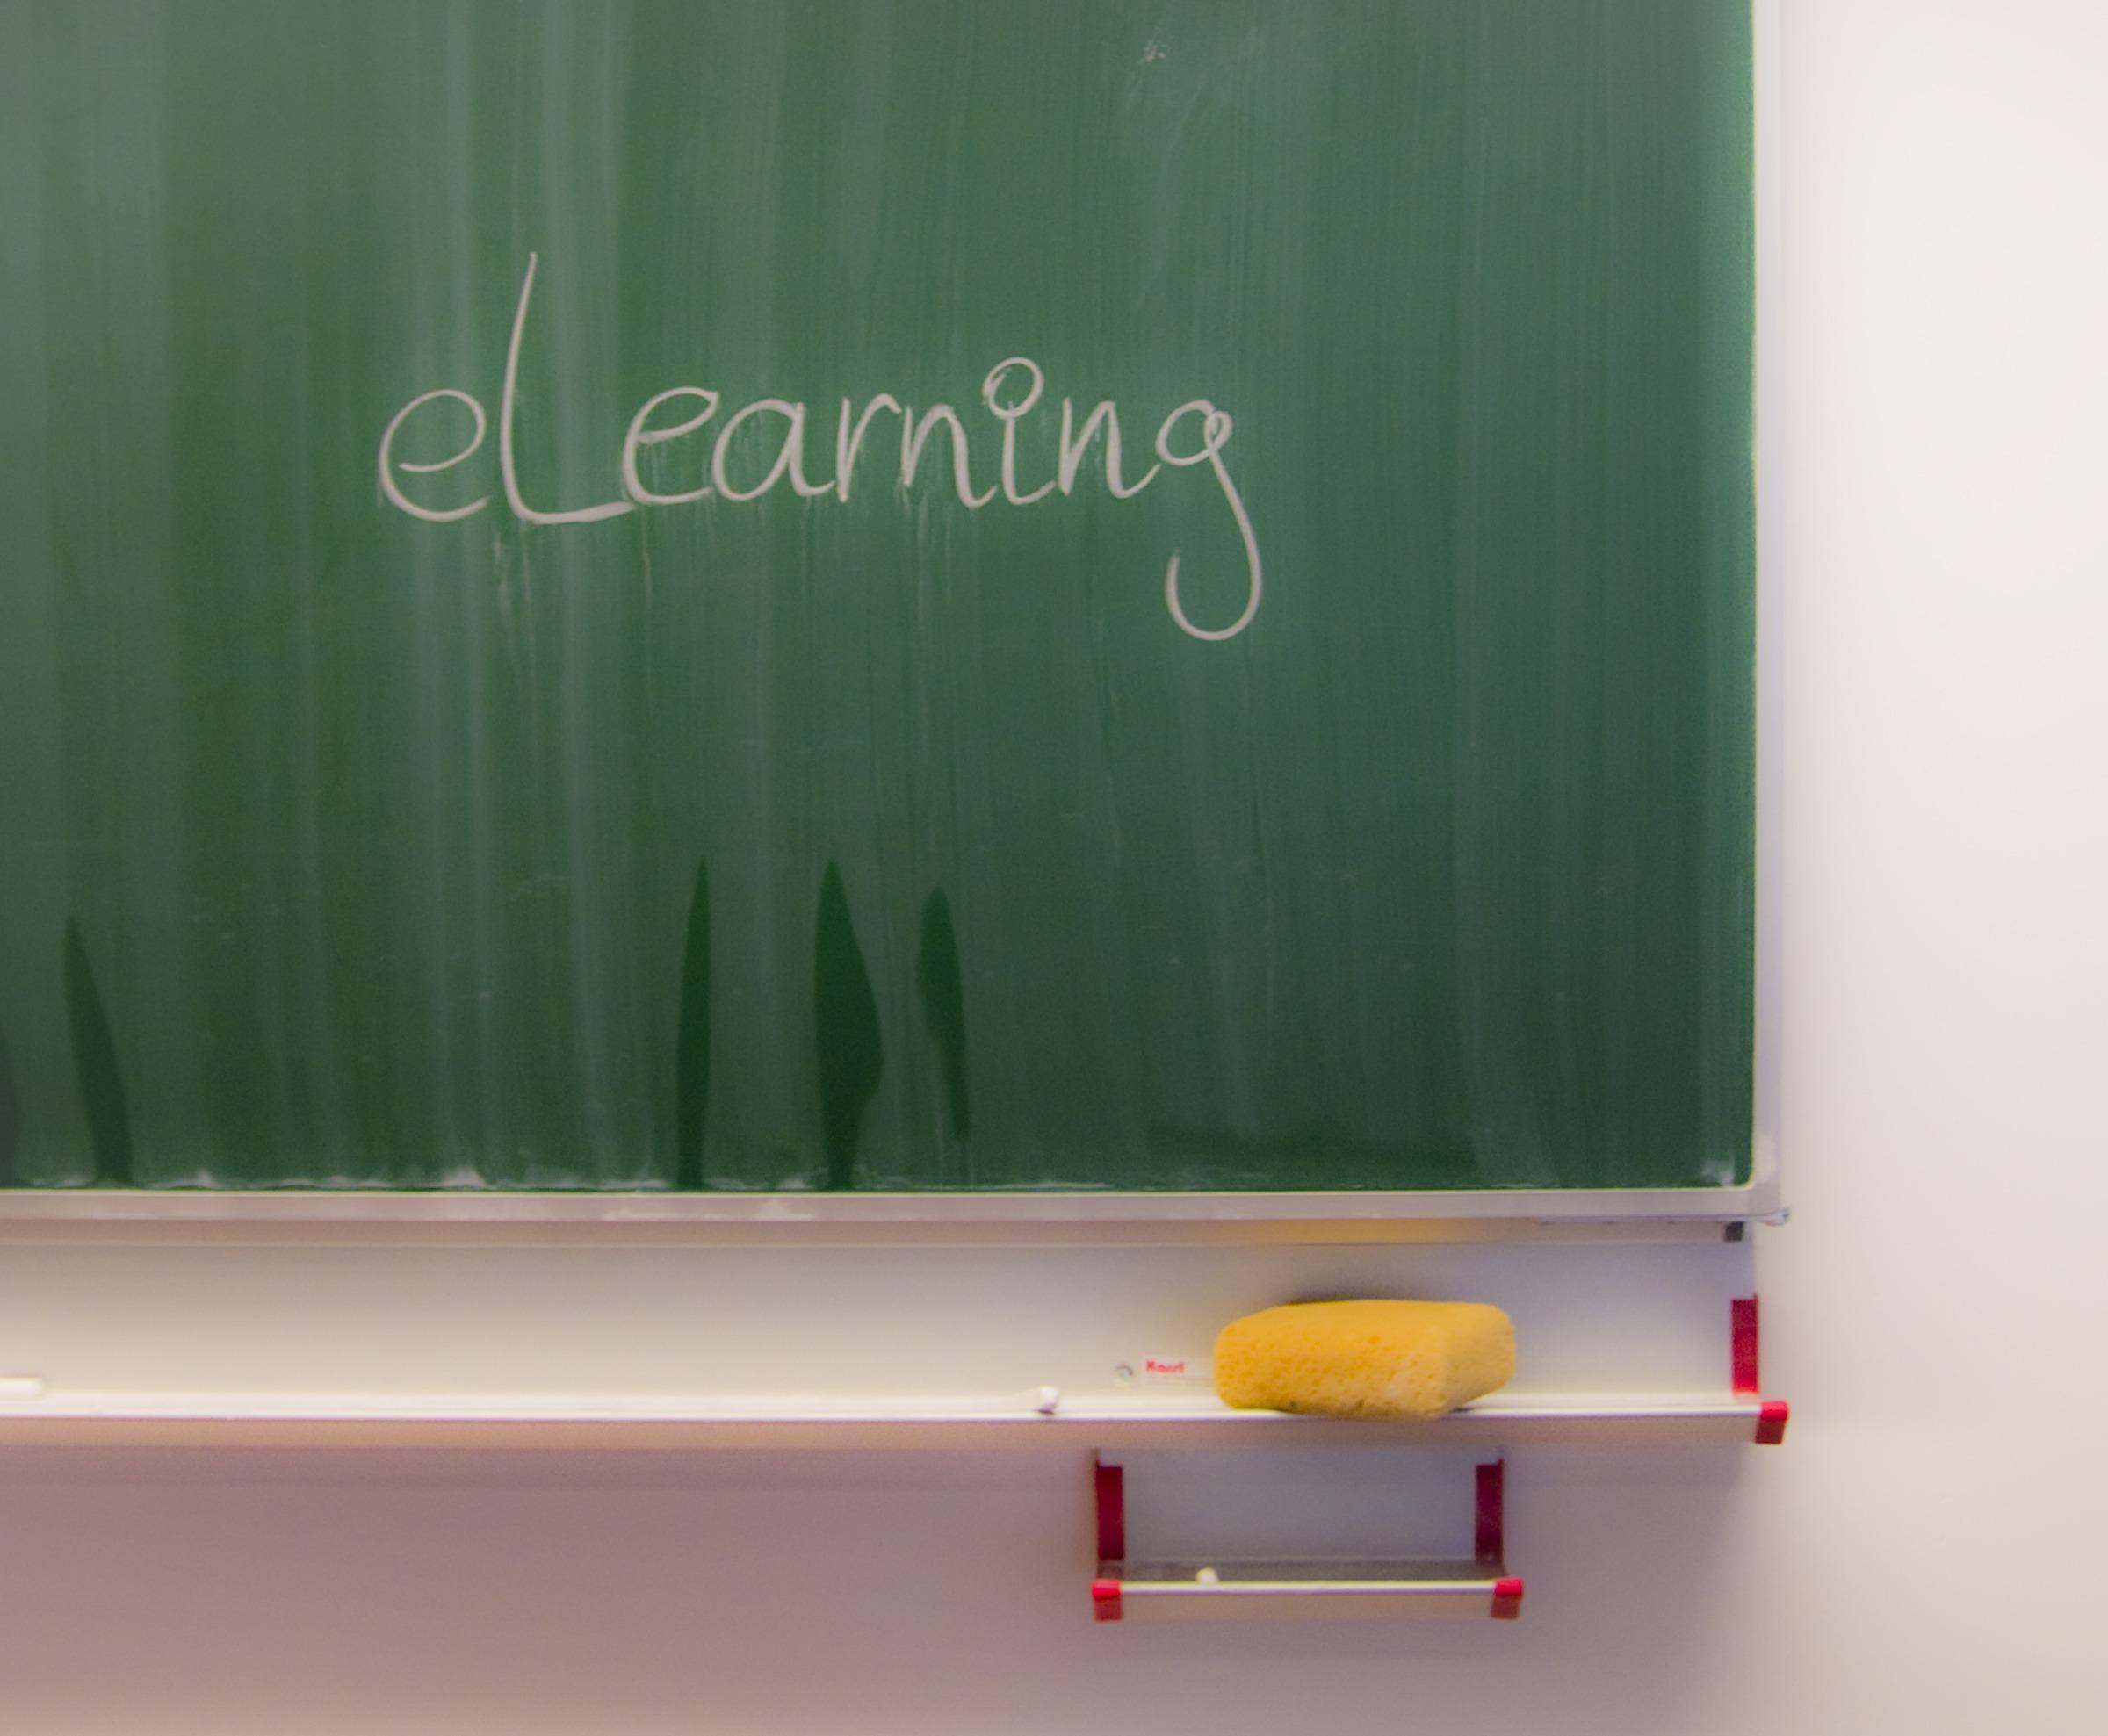 Classroom Blackboard Design ~ Free images writing board wall green color